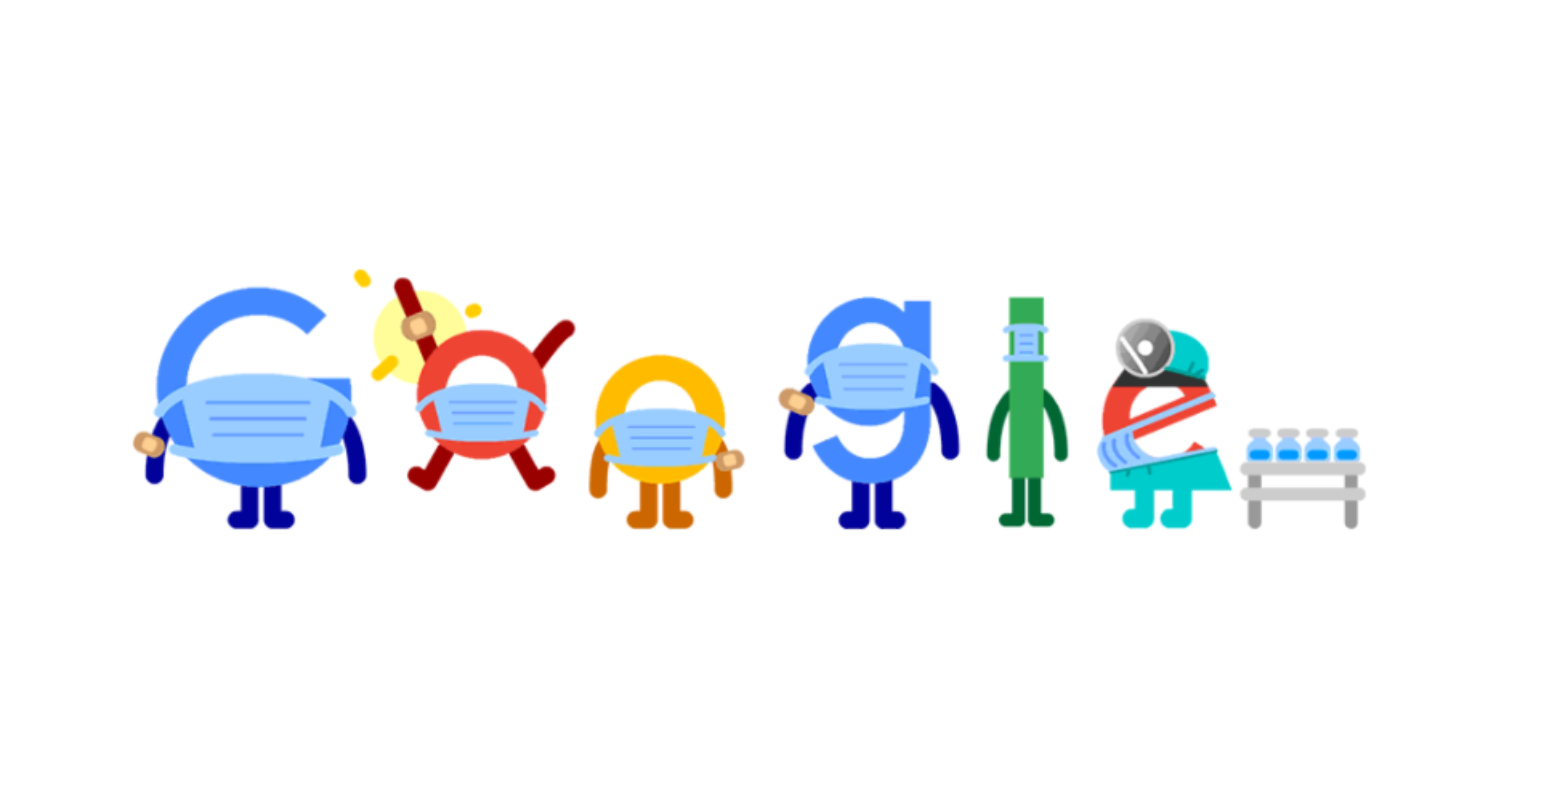 doodle google vacunate contra la covid